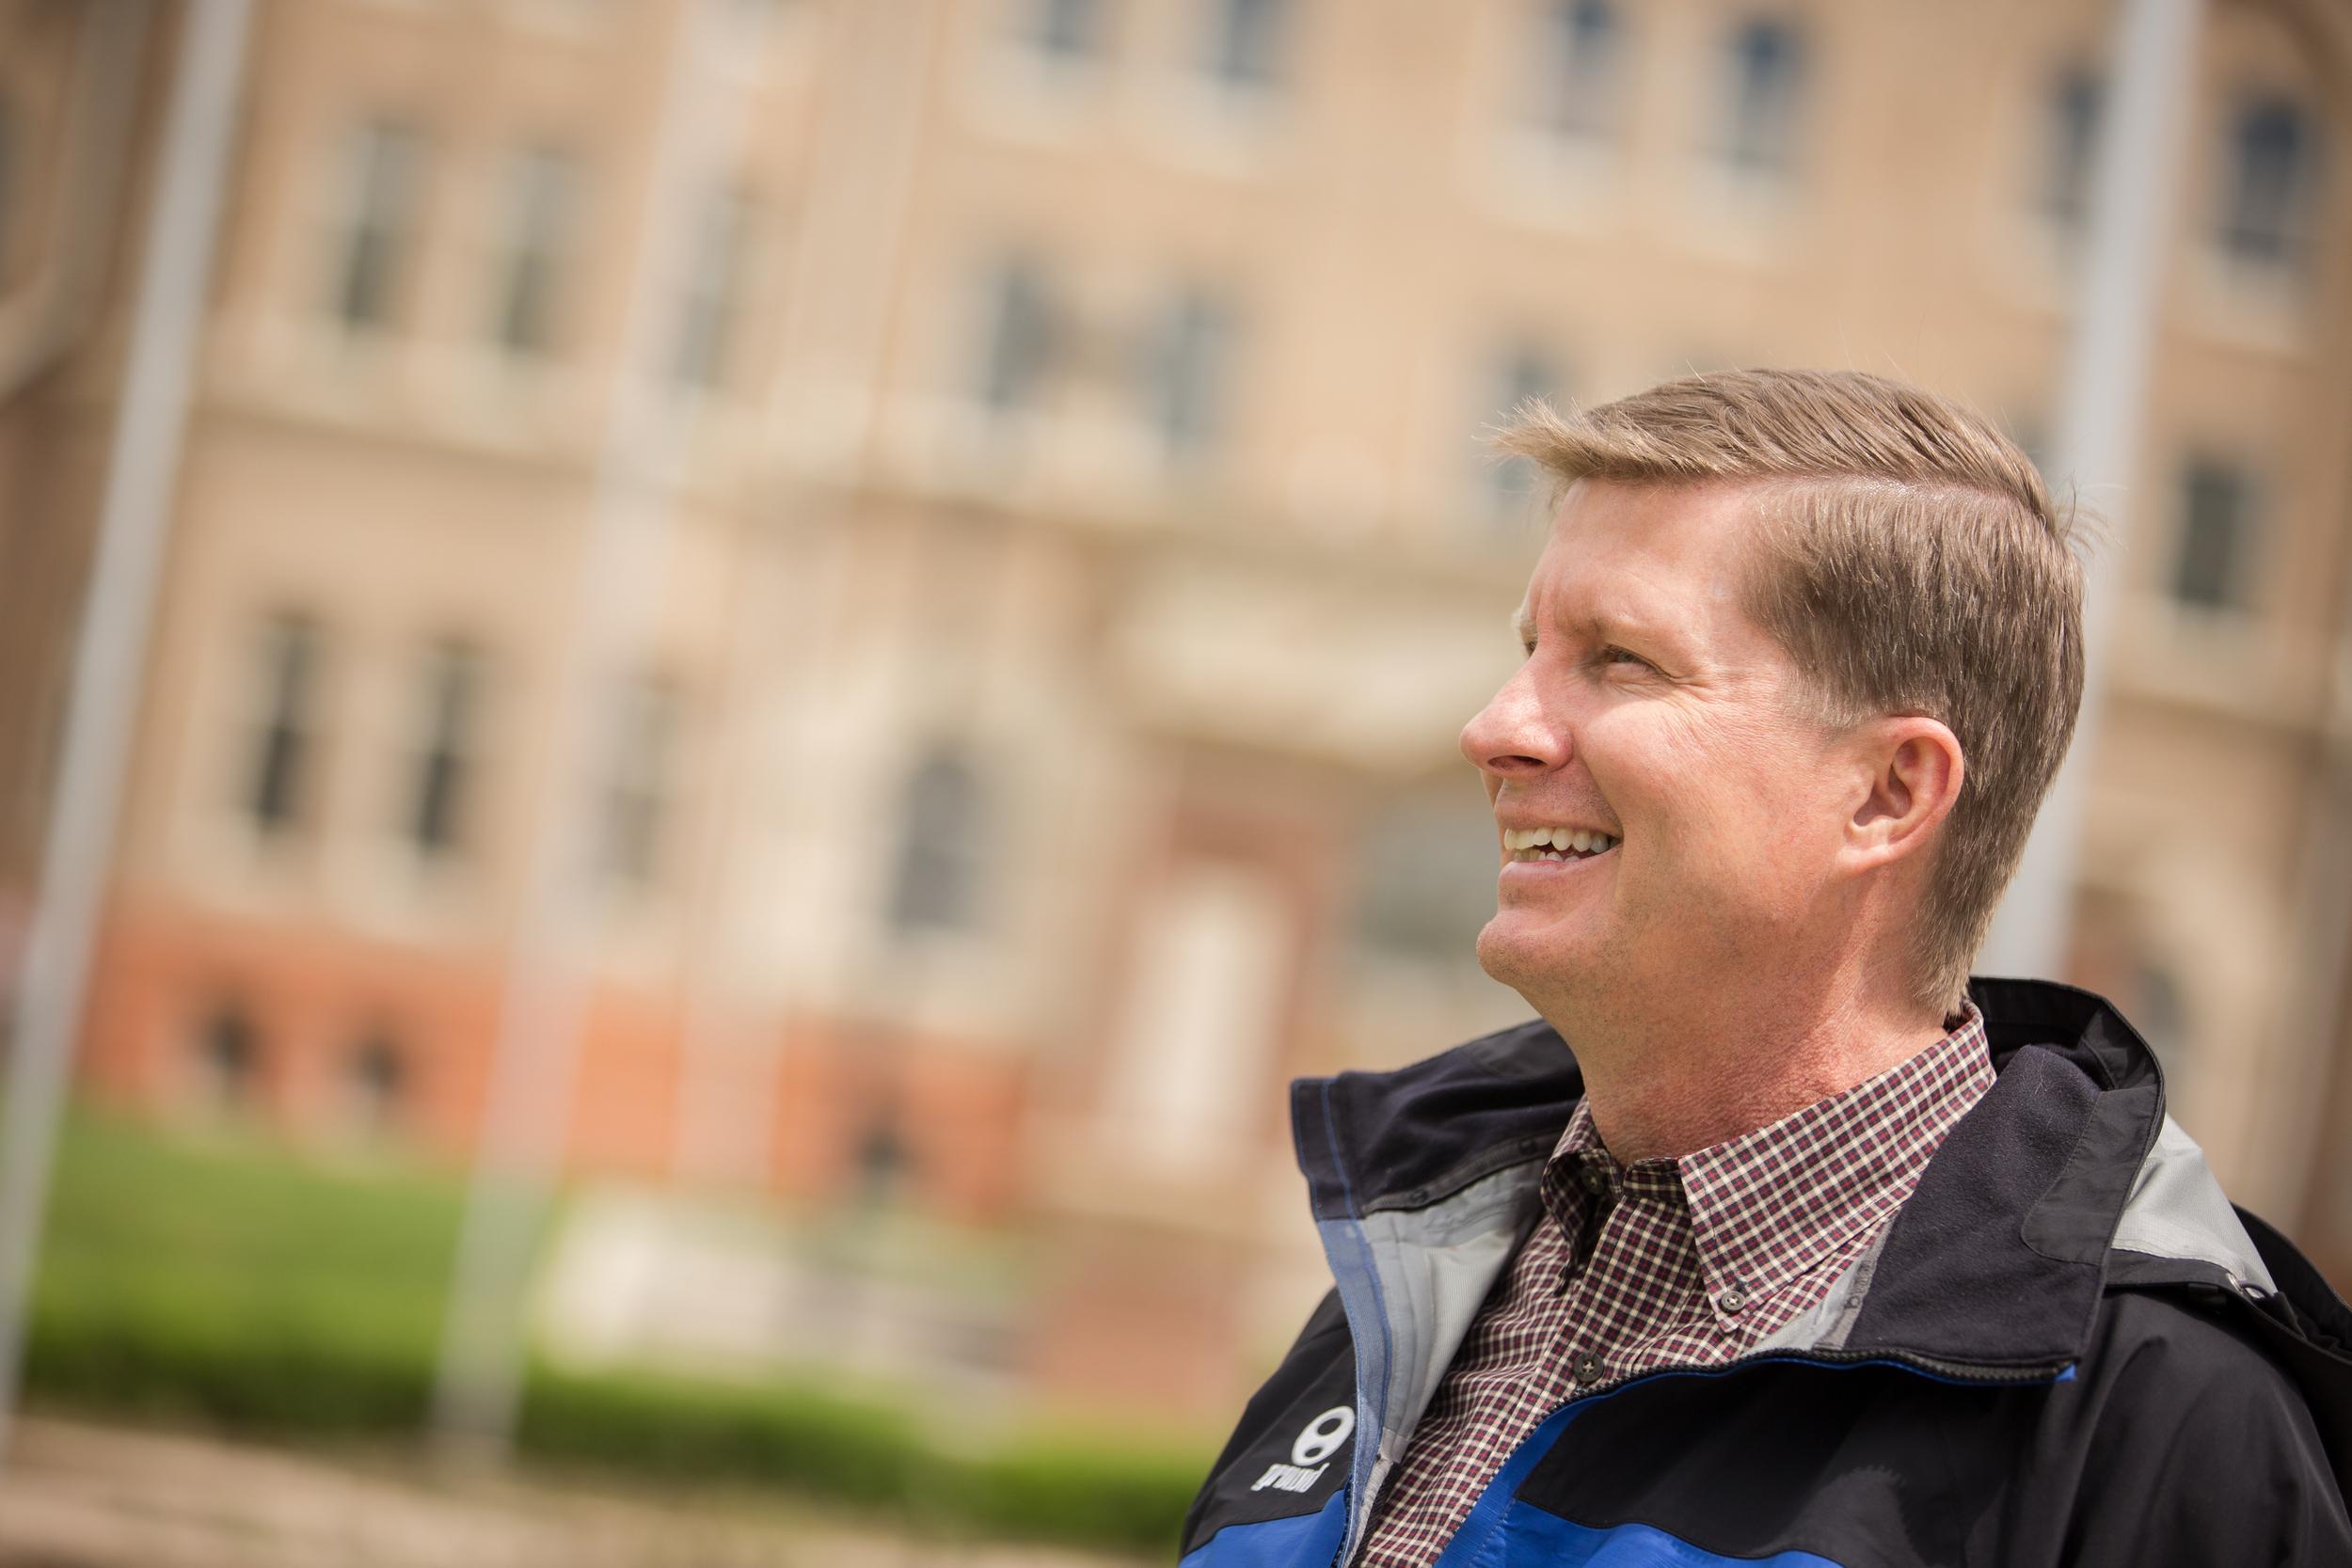 Exchange faculty member touring JWU 's campus